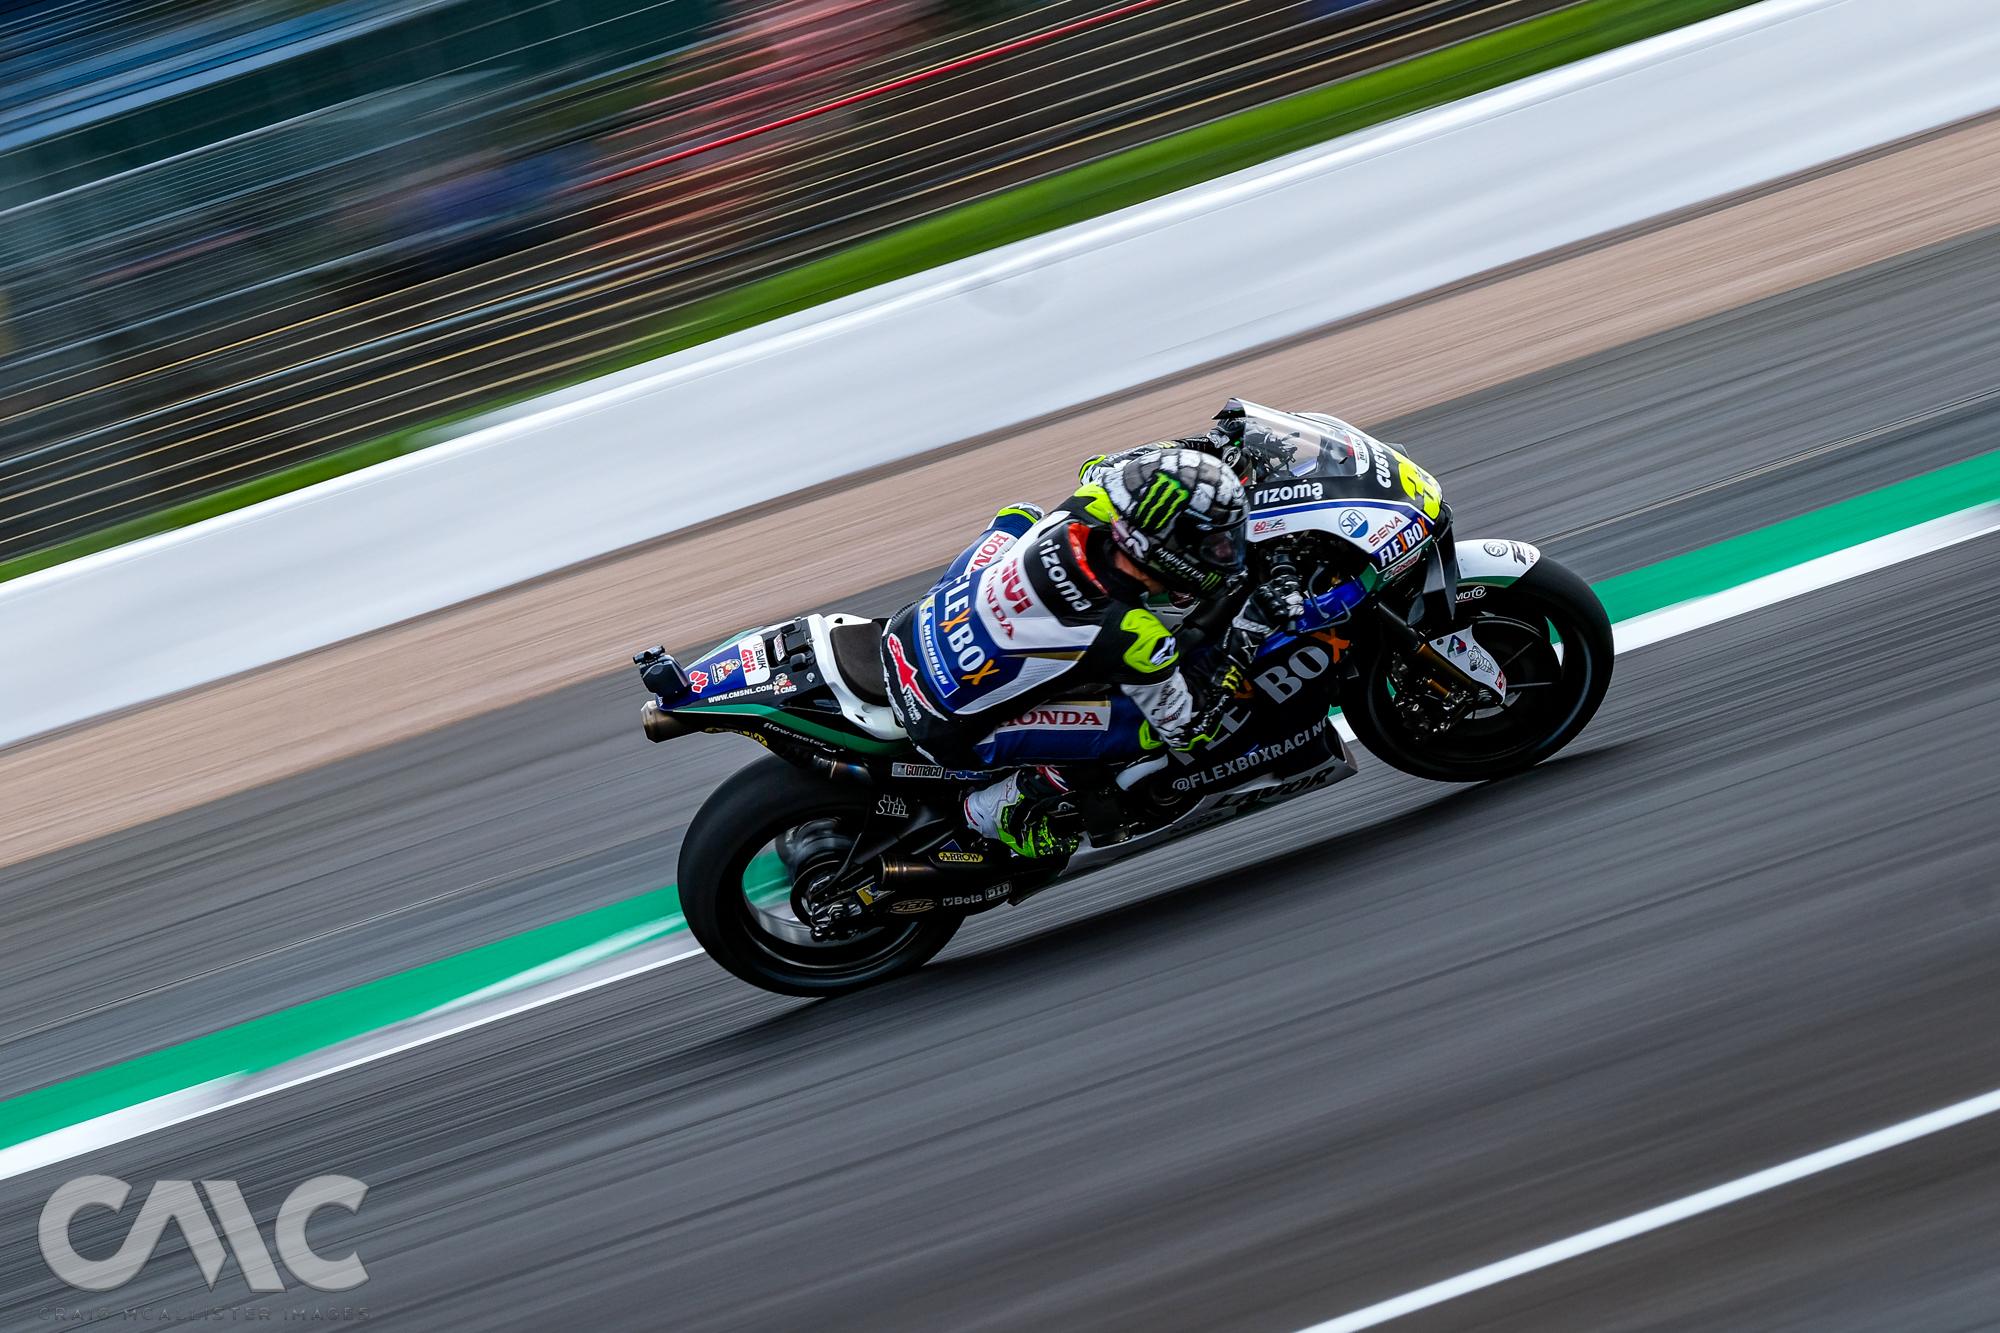 CMC_MotoGP_FP1_Silverstone 50-140261.jpg